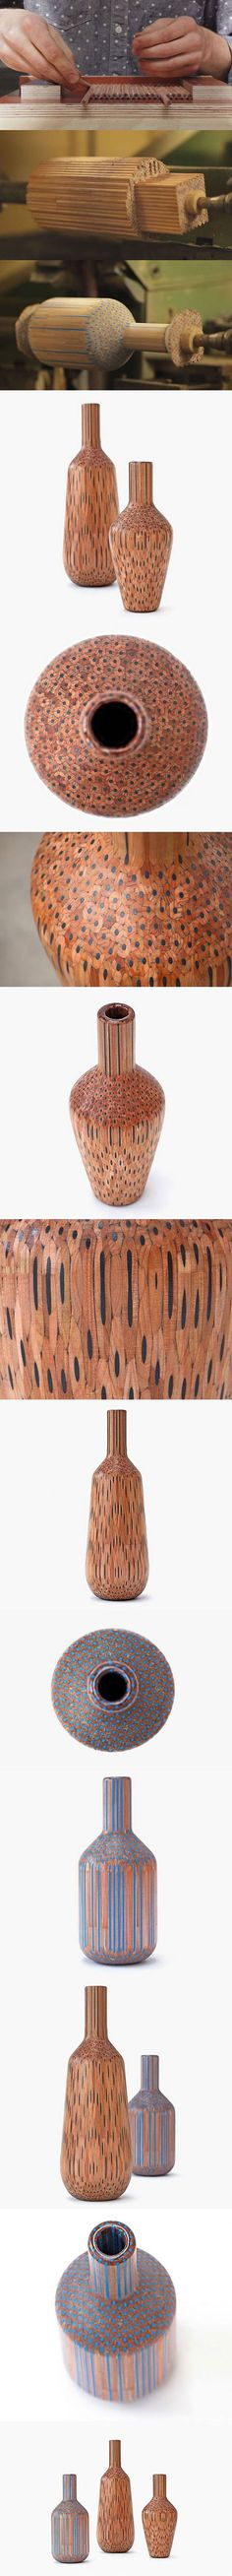 Man Transforms Pencils Into Beautiful Vases